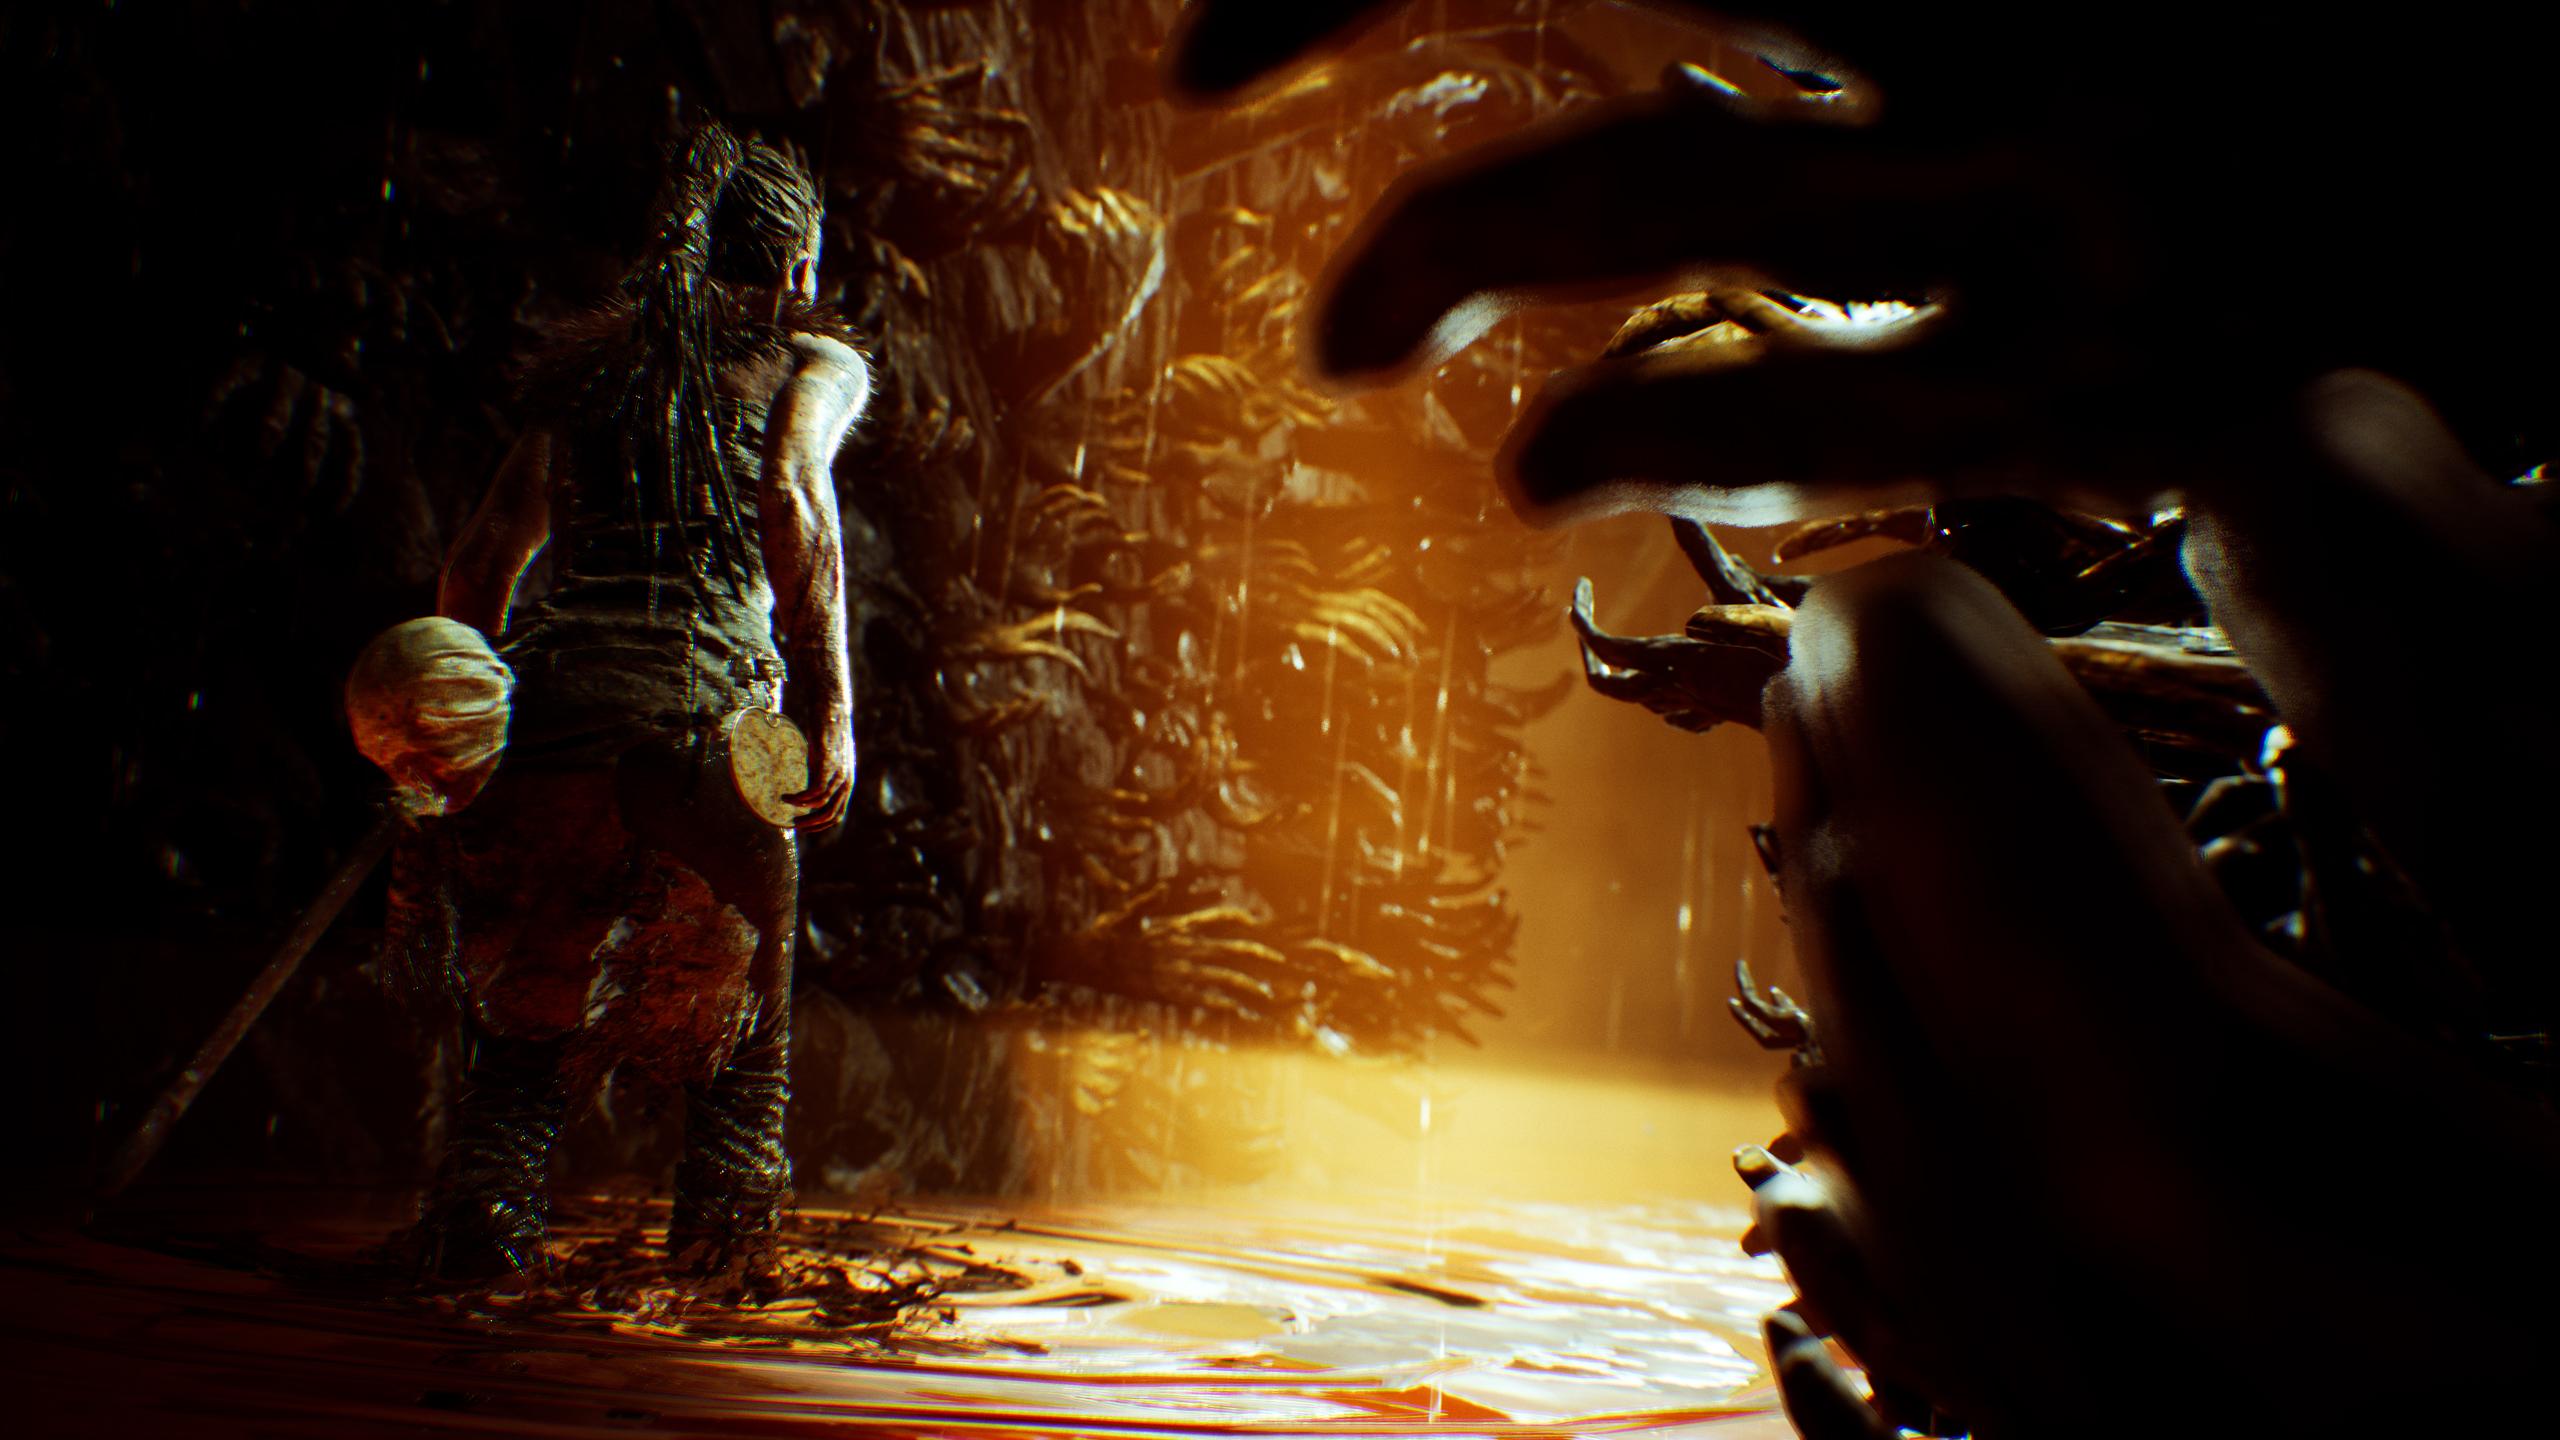 Hellblade: Senua's Sacrifice screenshot